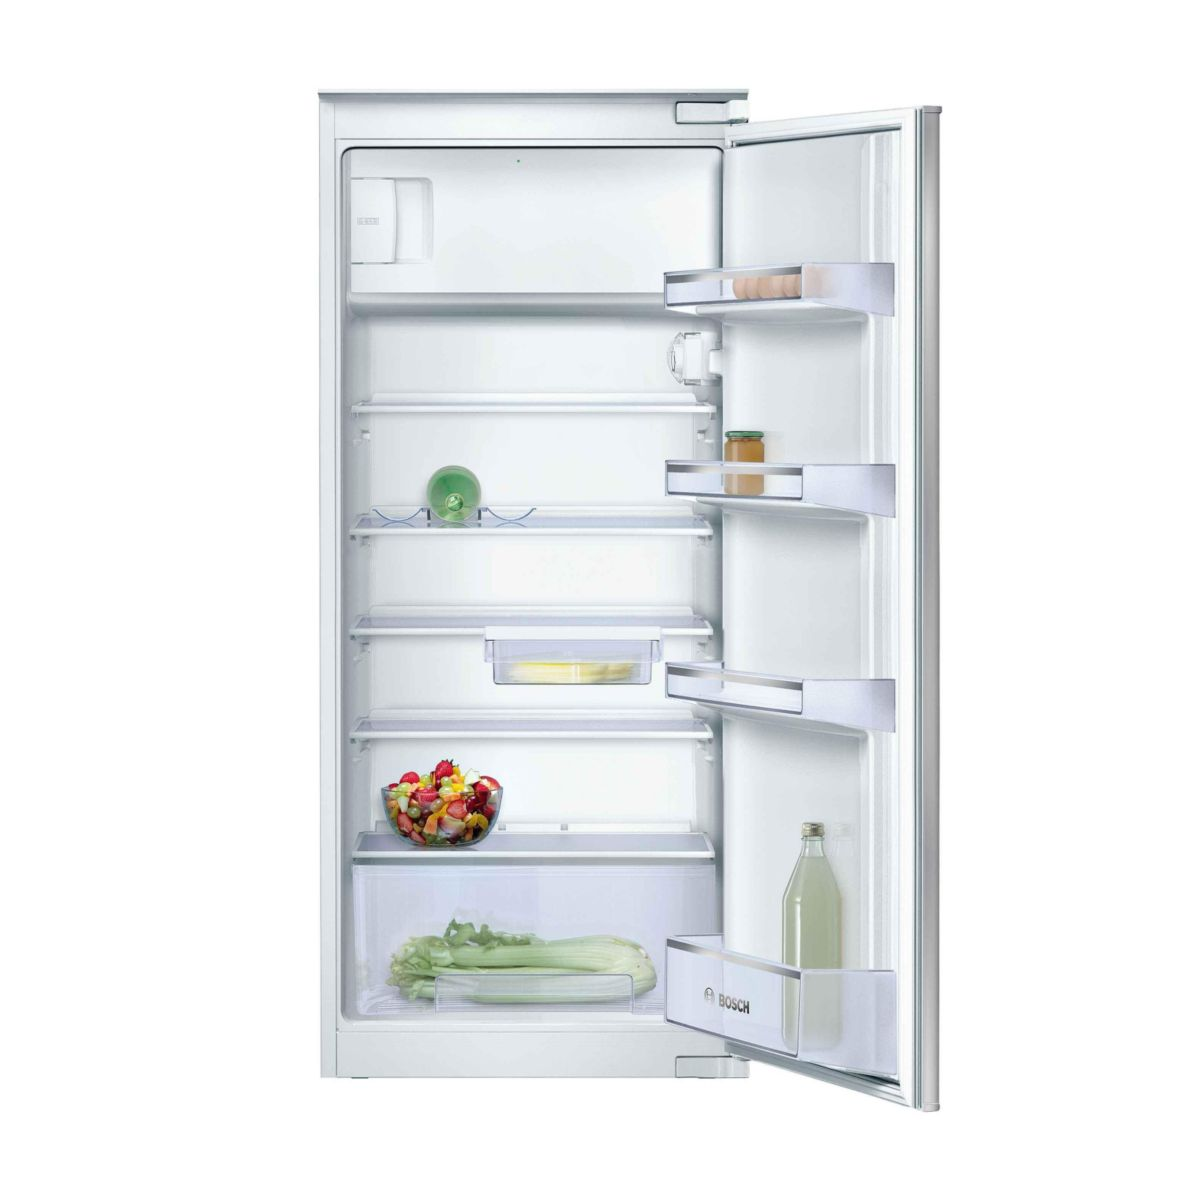 Réfrigérateur 1 porte encastrable BOSCH KIL24V21FF